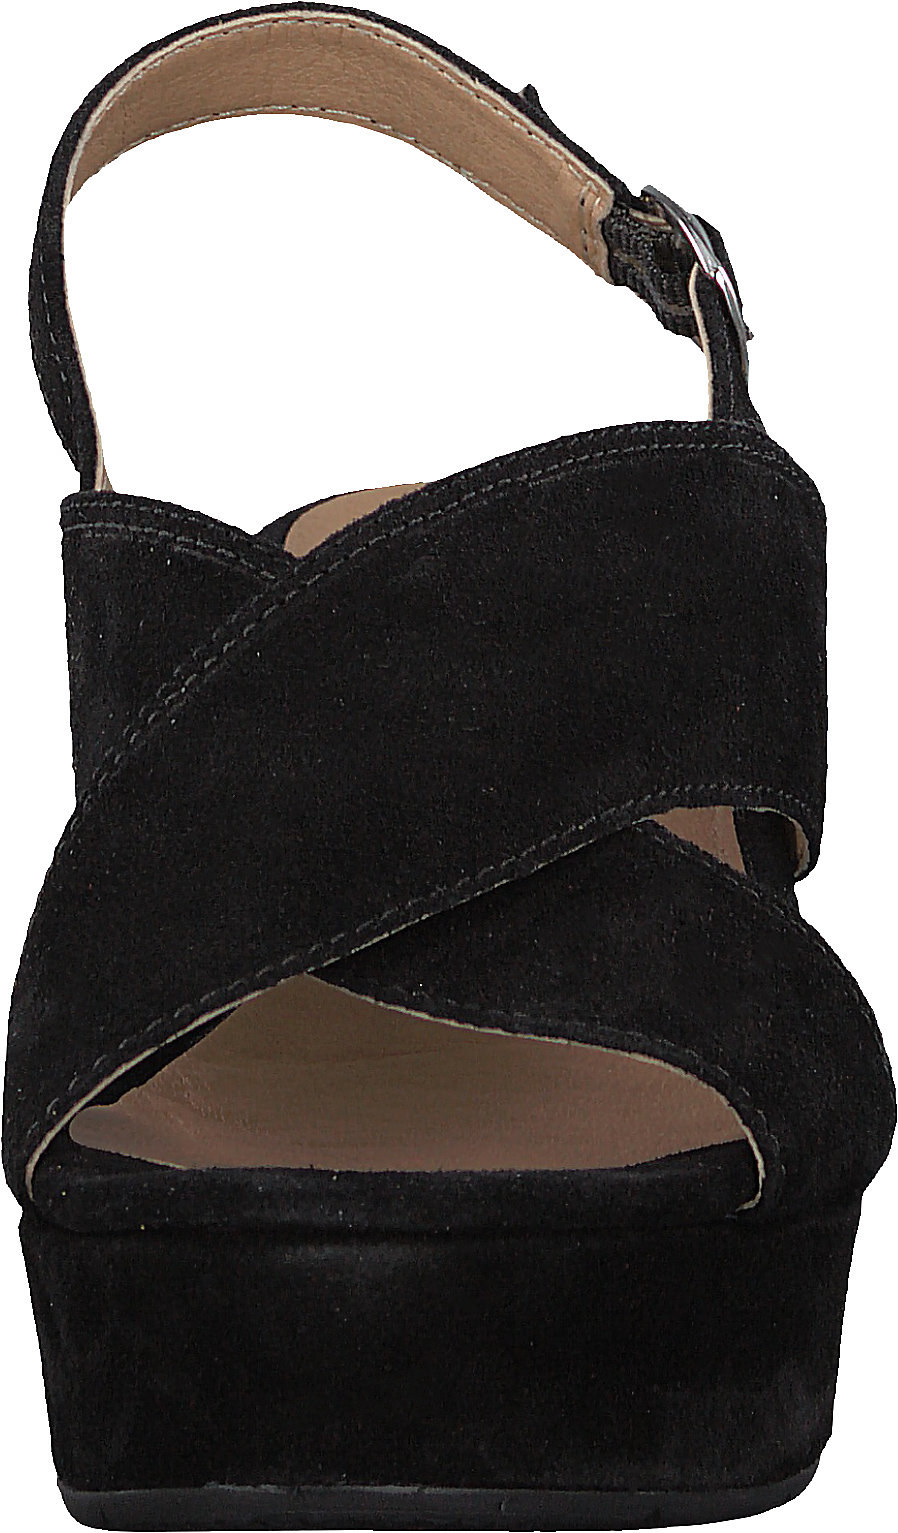 Neu Tamaris Plateau Sandaletten 7346307 für Damen schwarz | eBay